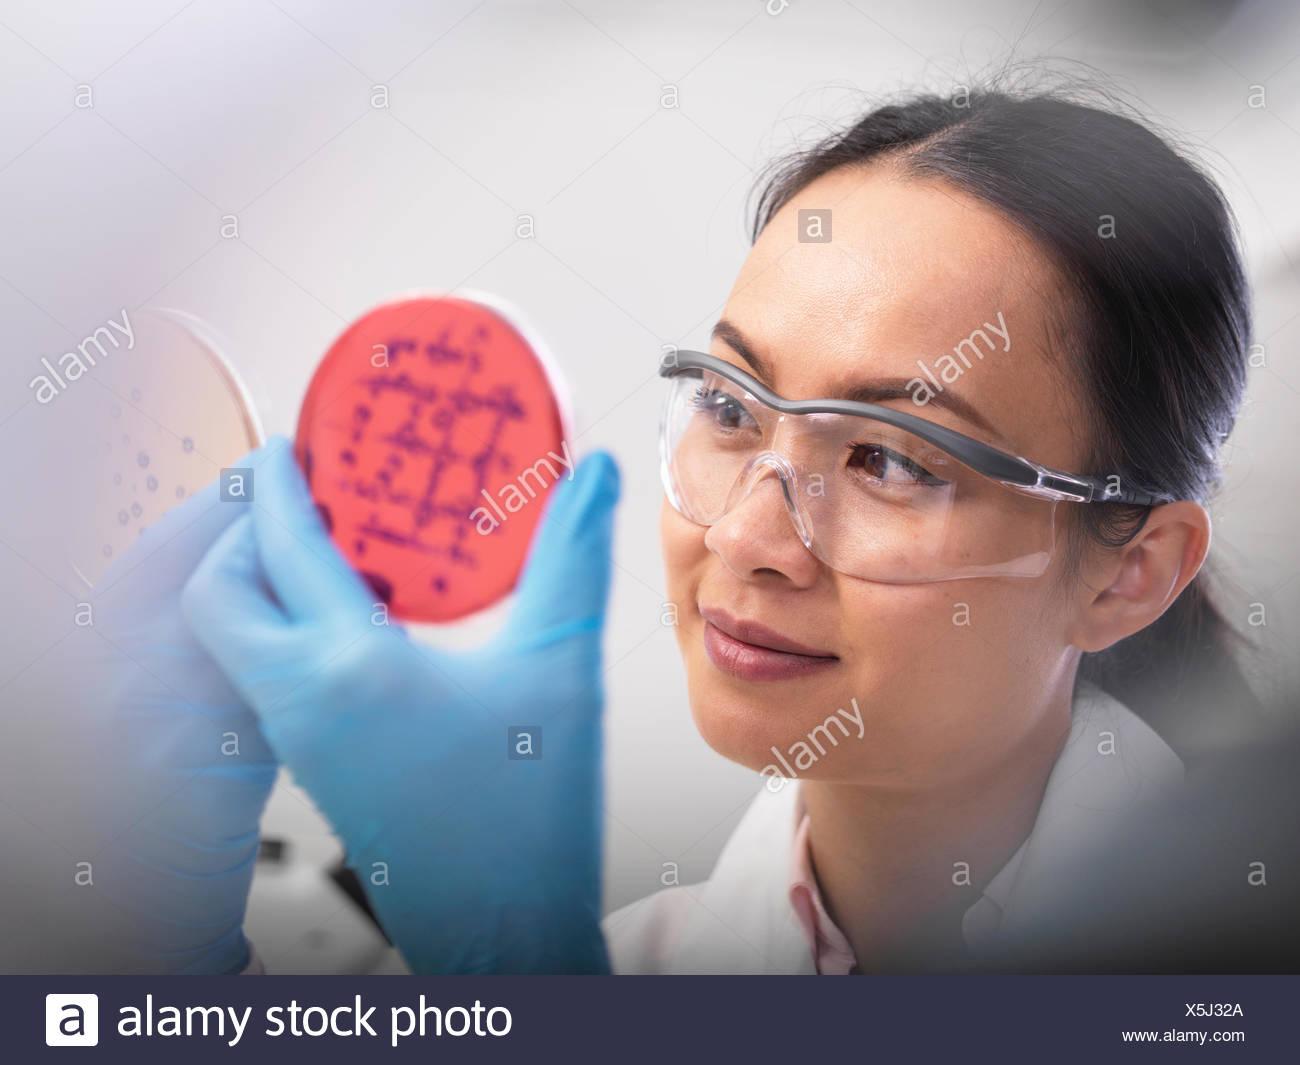 Wissenschaftler untersuchen mikrobiologische Kulturen in einer Petrischale Stockbild